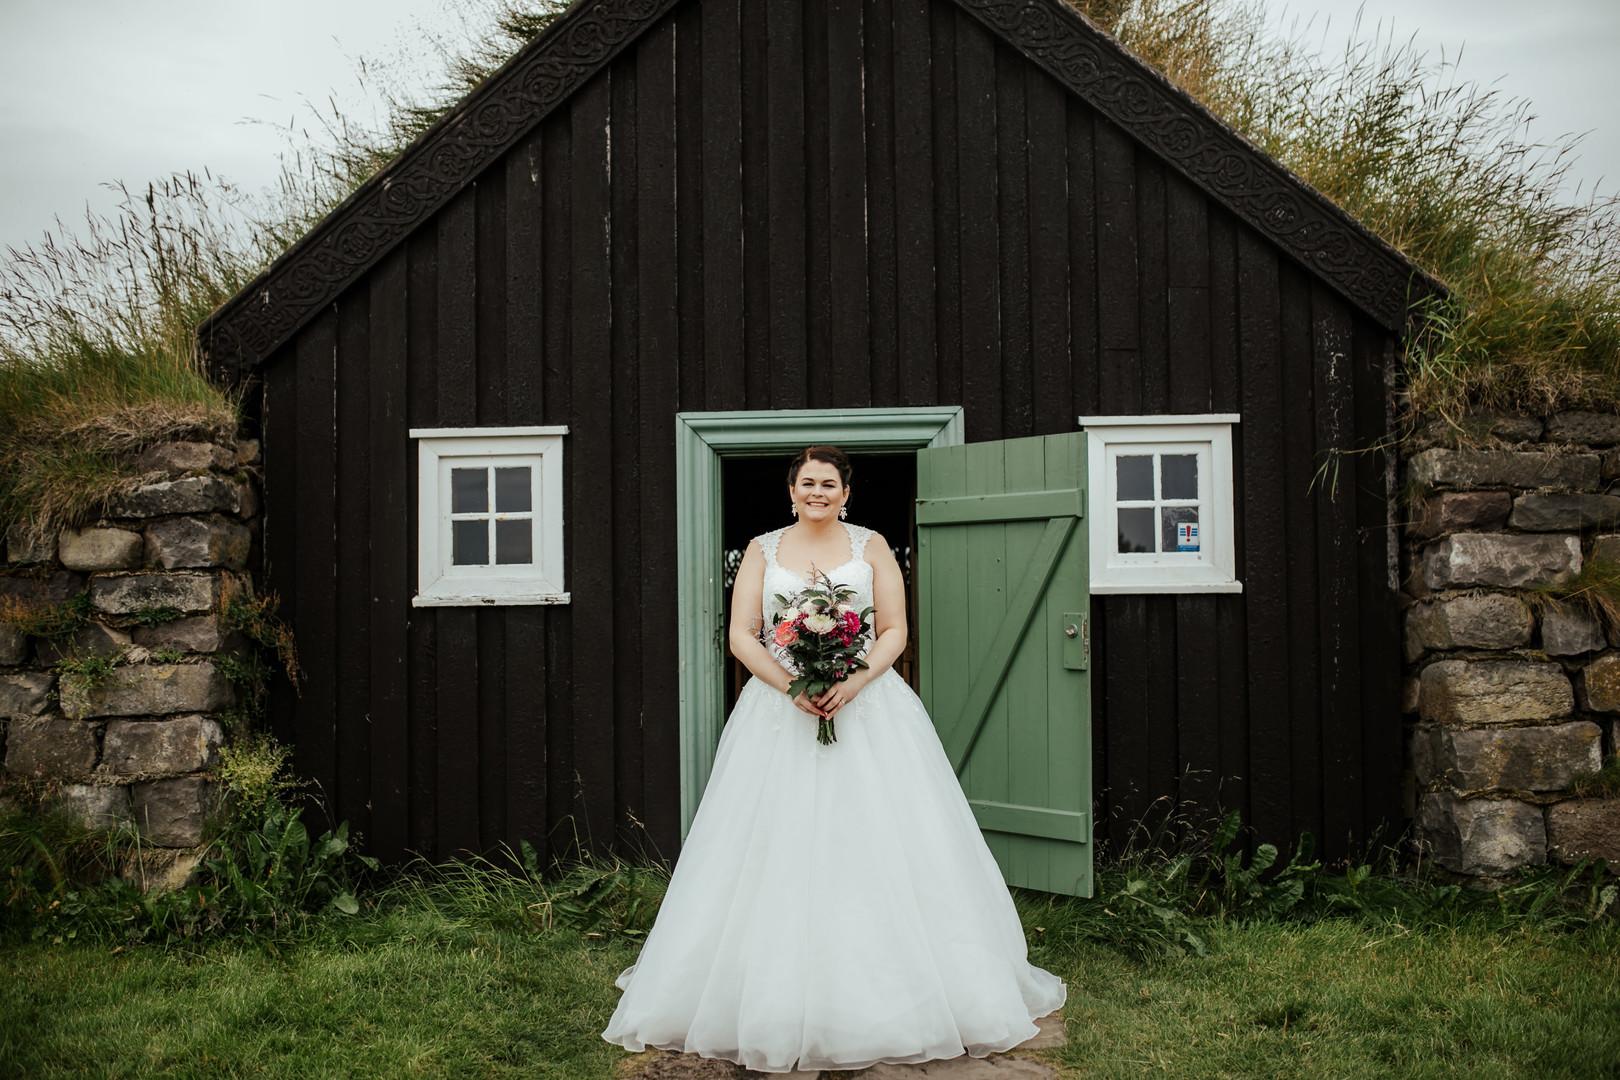 island+bröllop+destinationsbröllop+brudbukett